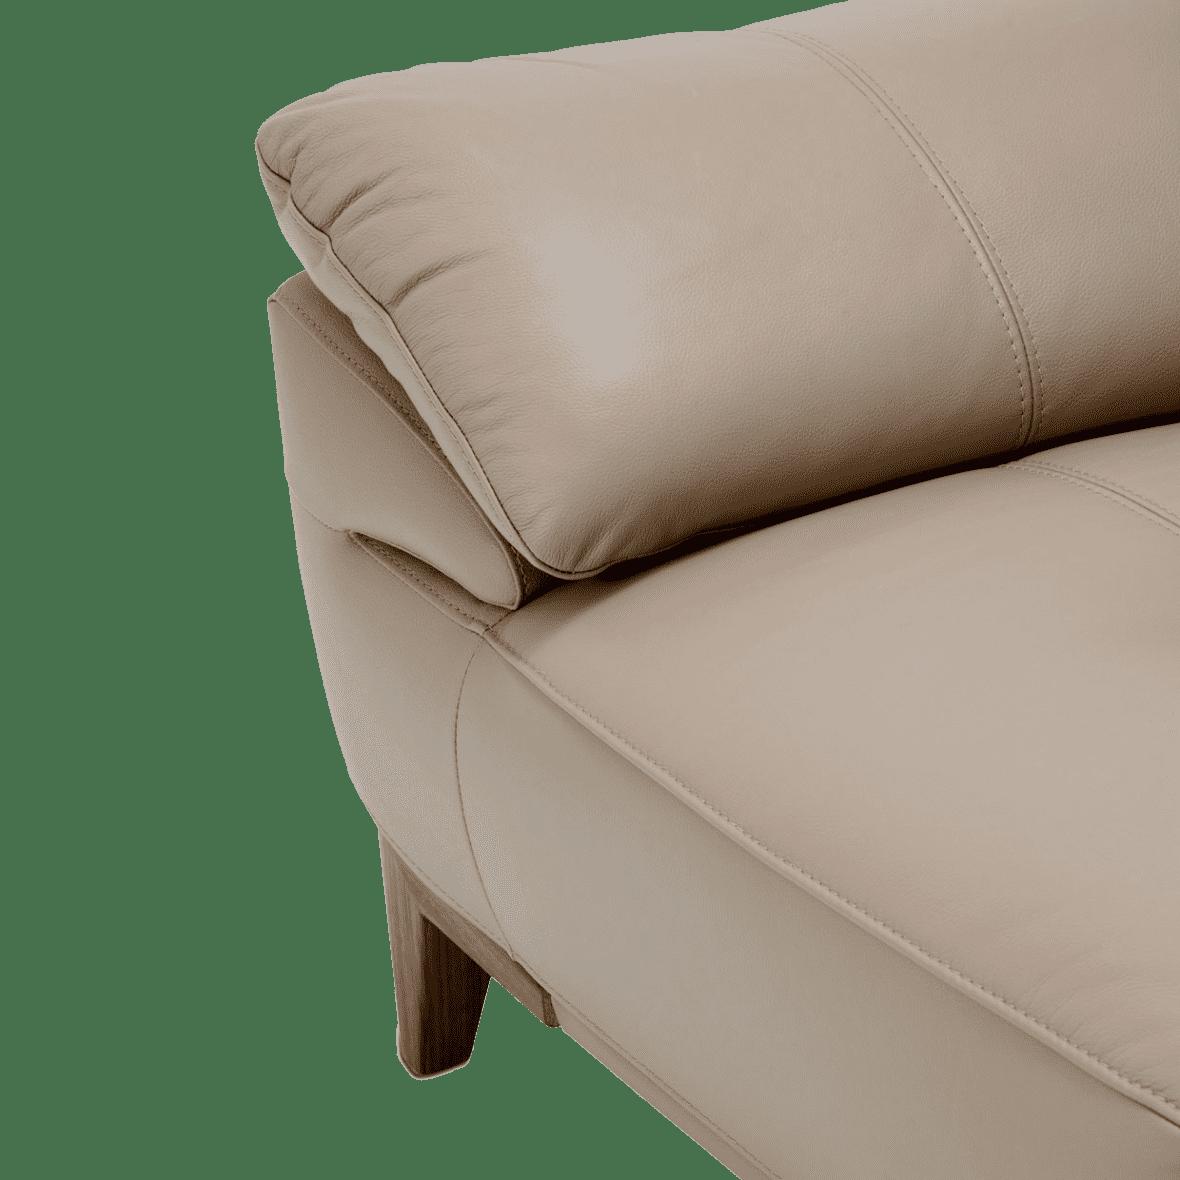 Turano кресло матовая кожа, Mocha